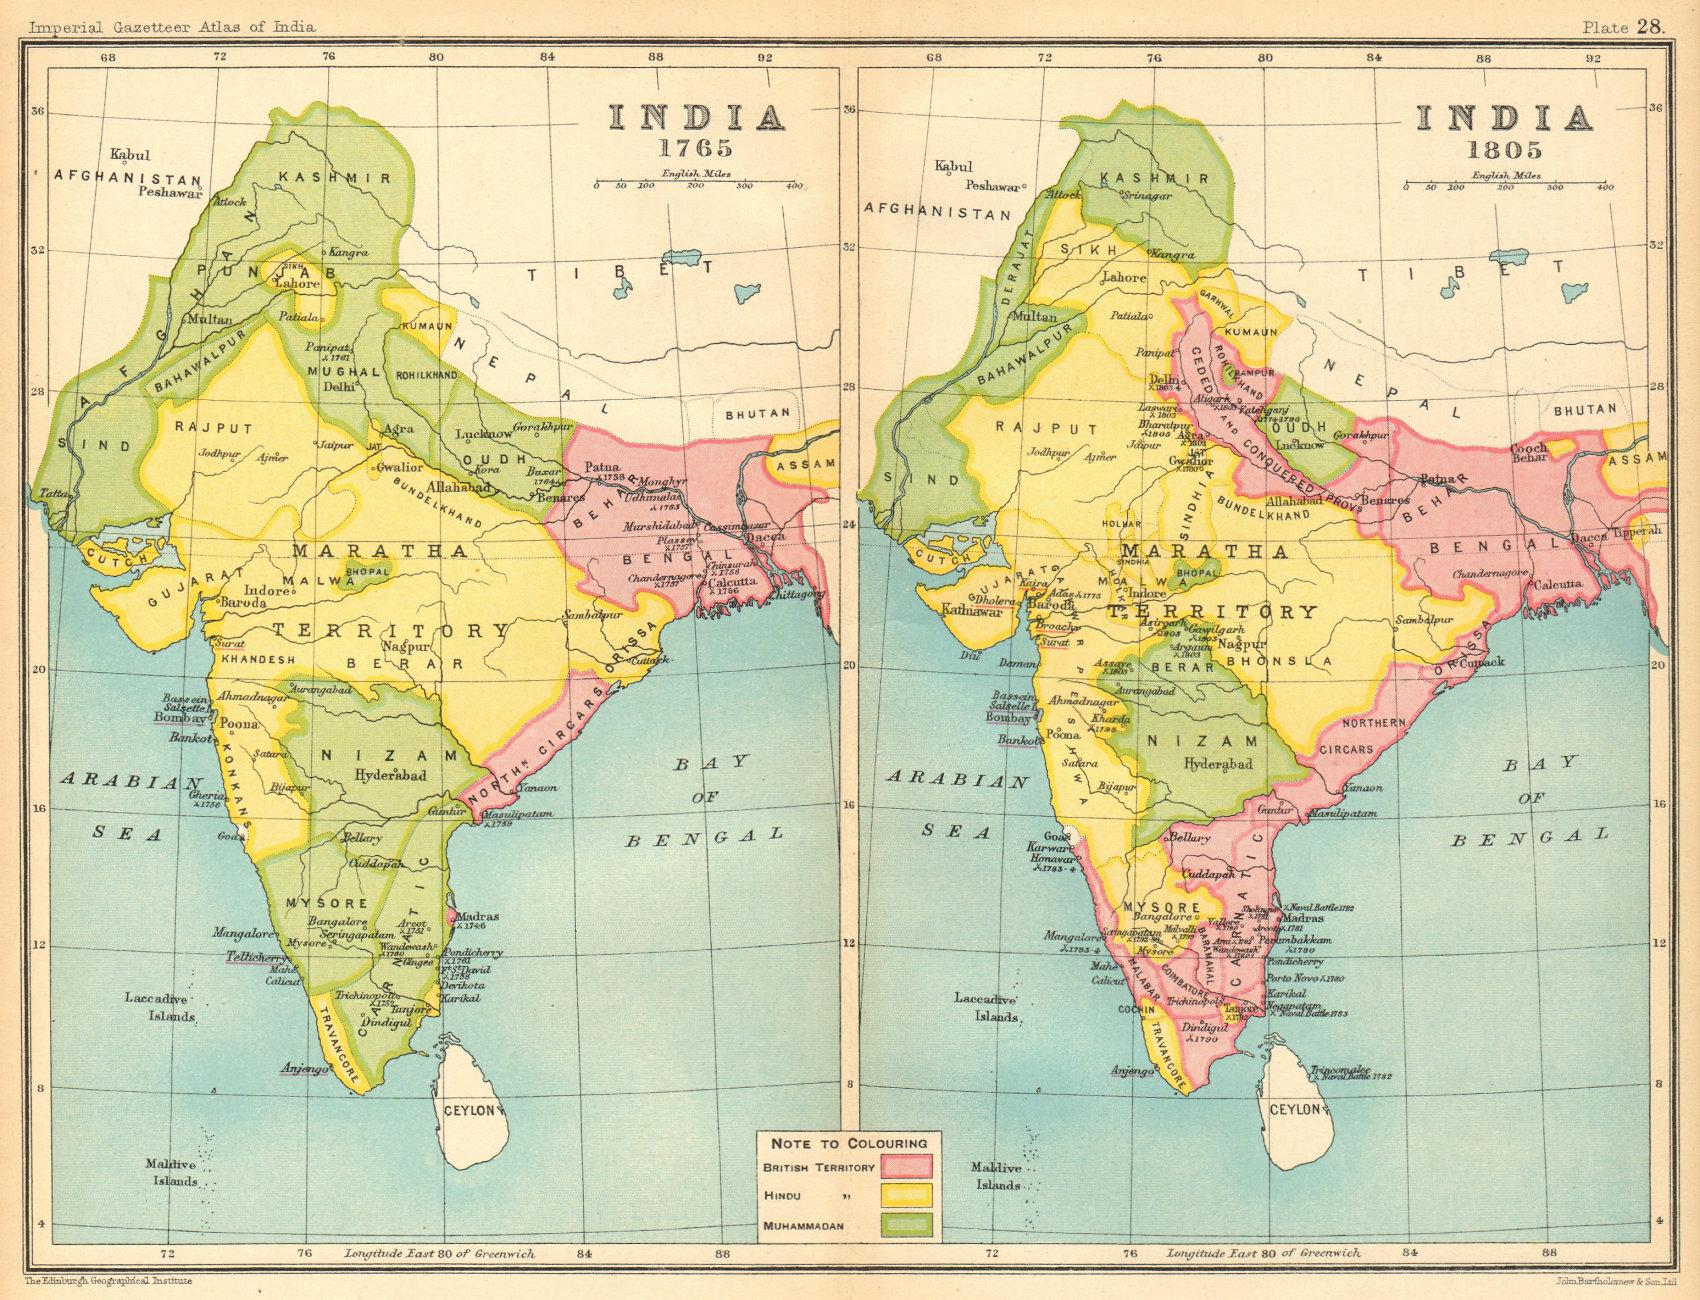 INDIA HISTORICAL. 1765 & 1805. British, Hindu & Muslim states 1931 old map